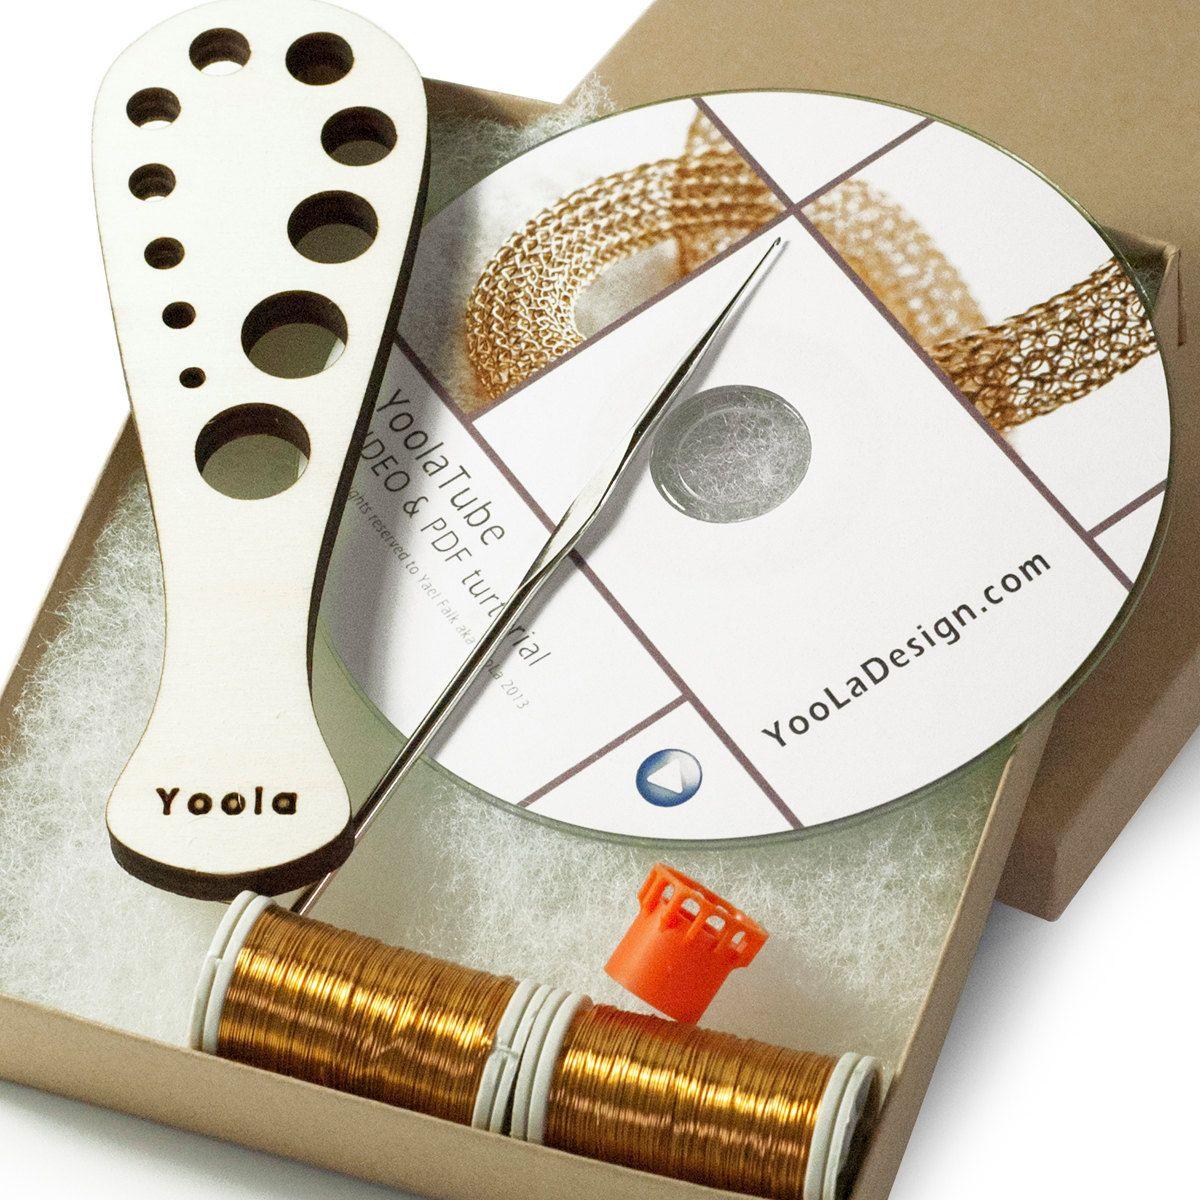 KIT  VIDEO kit for crochet wire gold necklace YoolaTube от Yoola, $62,00